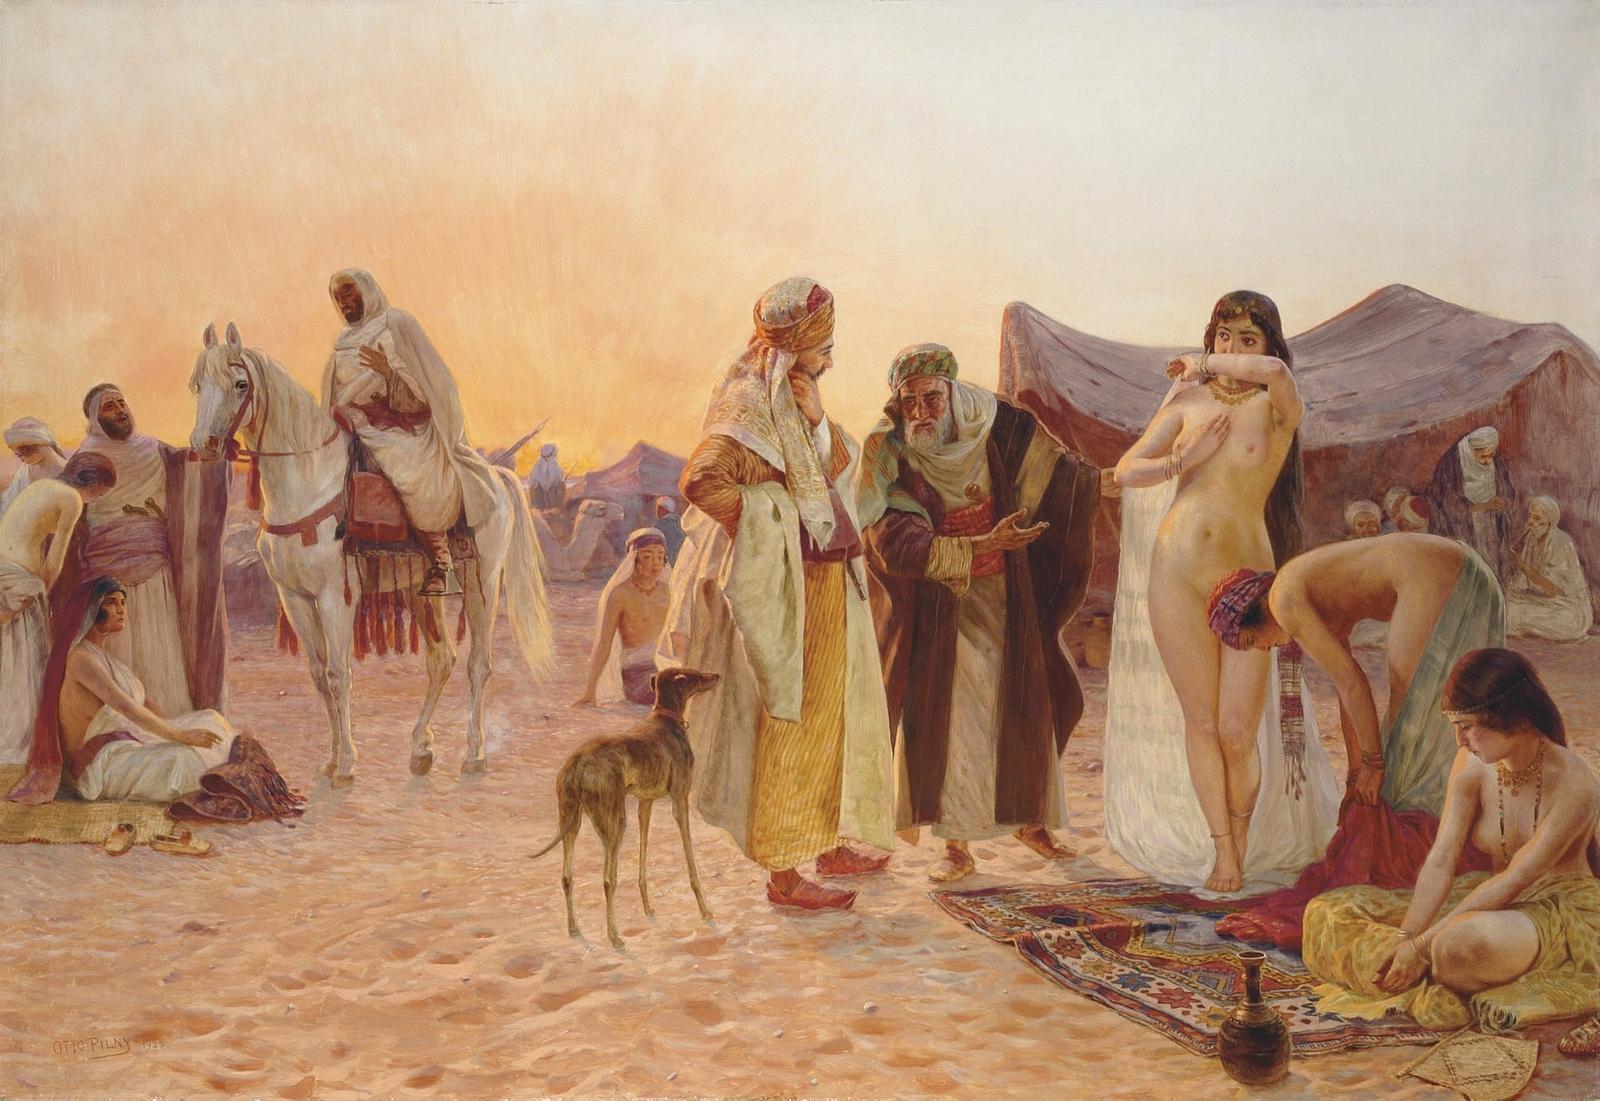 Lalla essaydi revives the exotic to critique exoticism